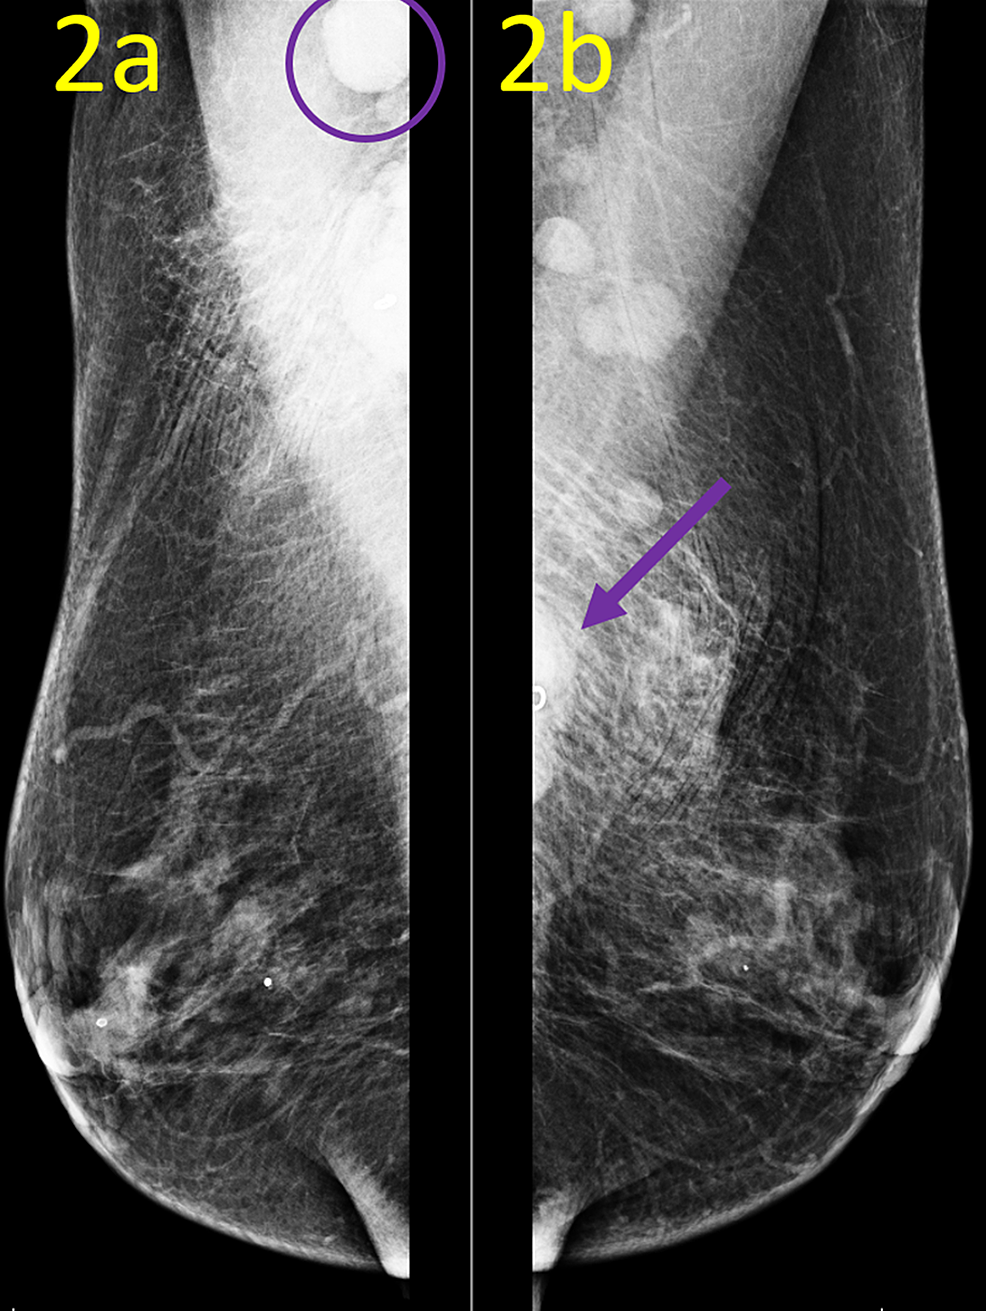 Postbiopsy-Mammogram-Mediolateral-Oblique-(MLO)-Views